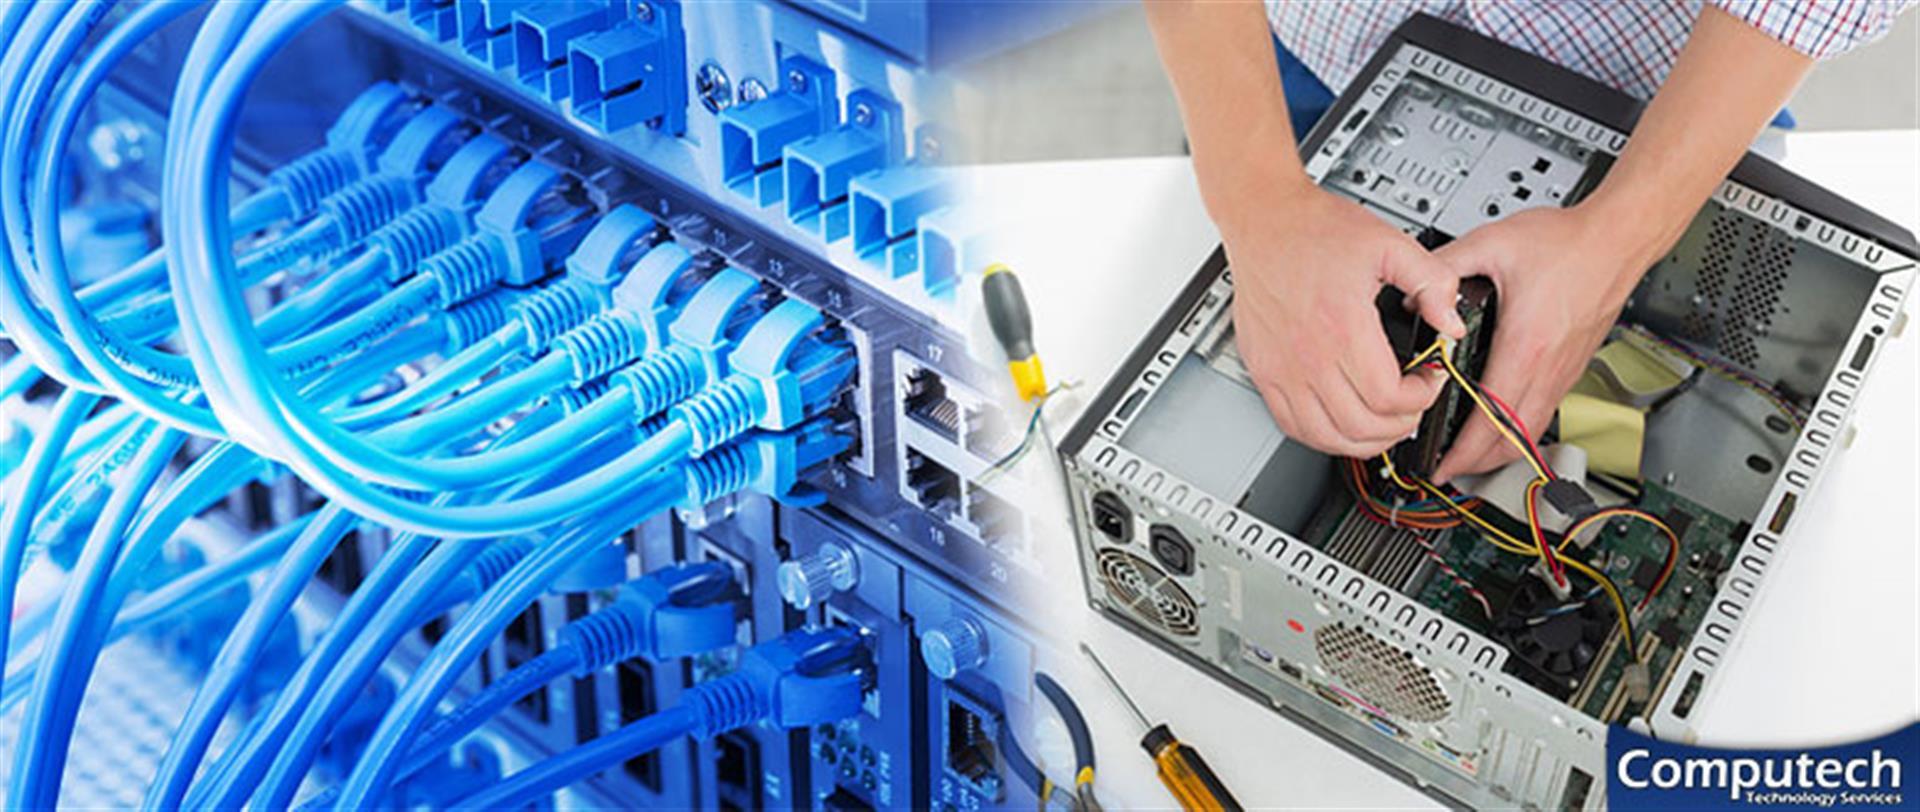 Clayton Alabama Onsite PC & Printer Repairs, Network, Voice & Data Wiring Services